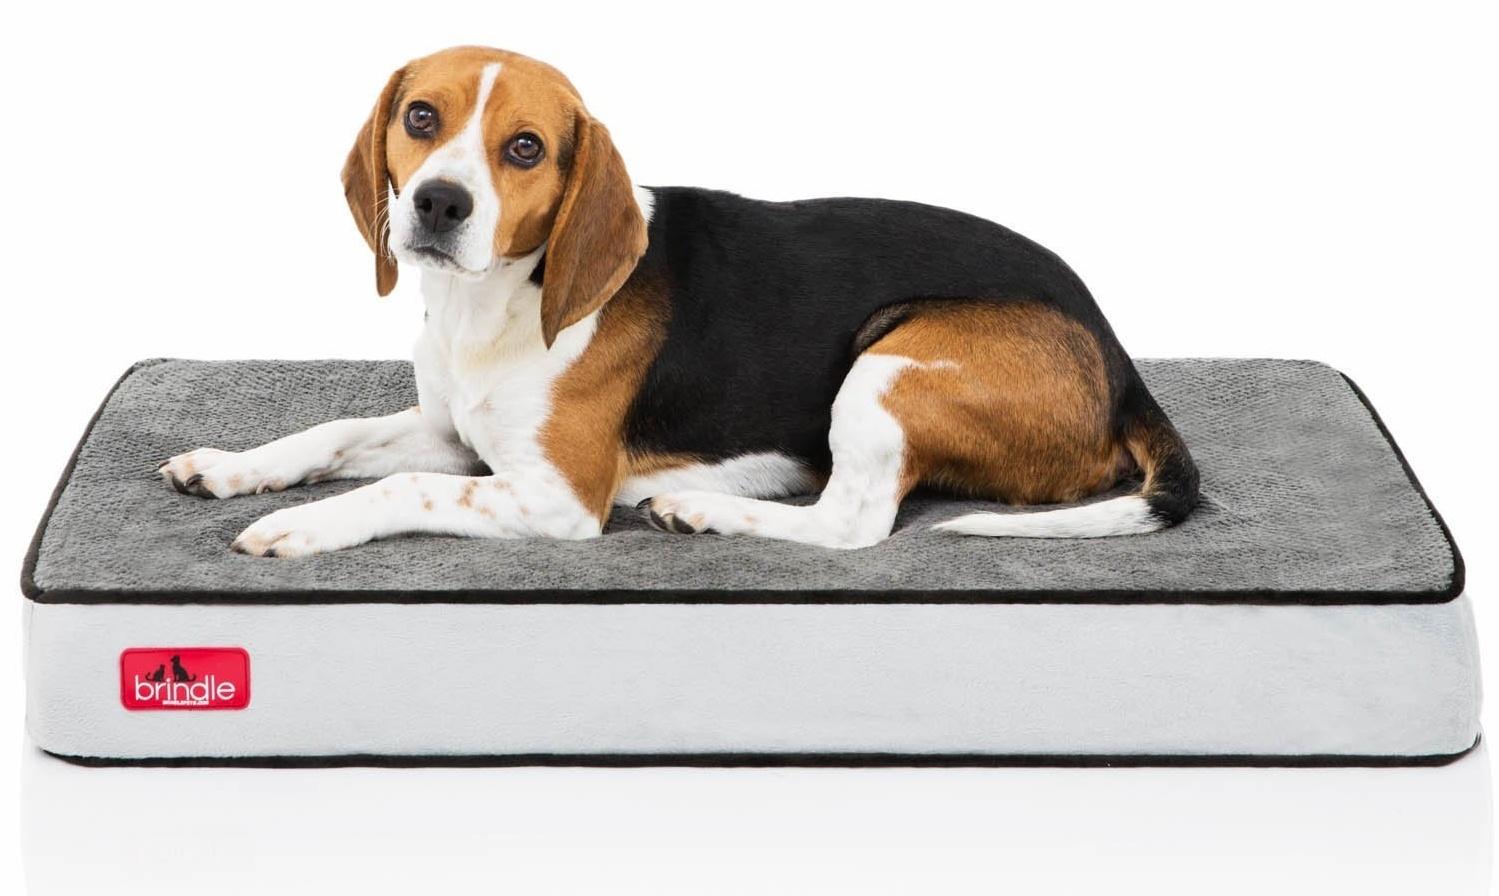 Brindle-foam-dog-bed